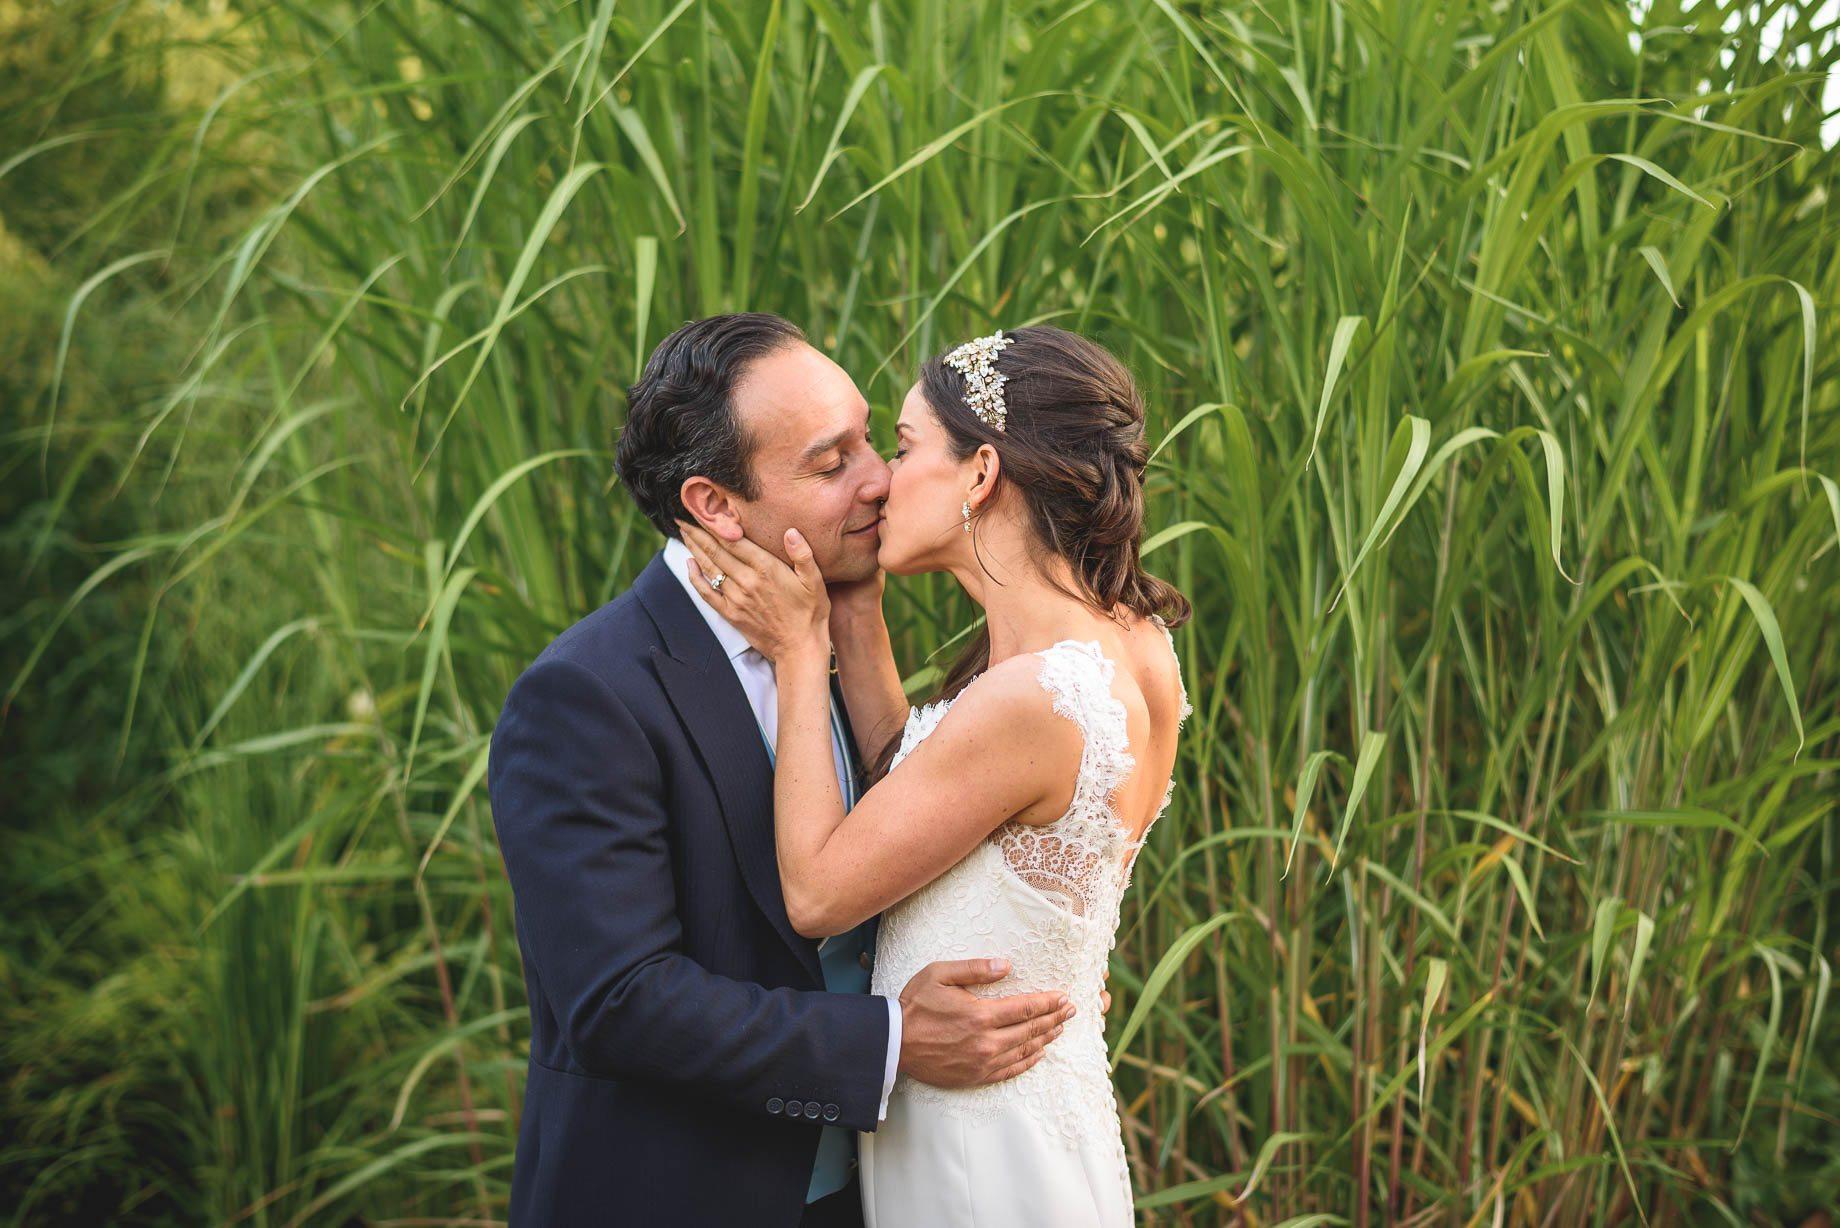 Bury Court Barn Wedding Photography - Caroline and Rob (173 of 219)